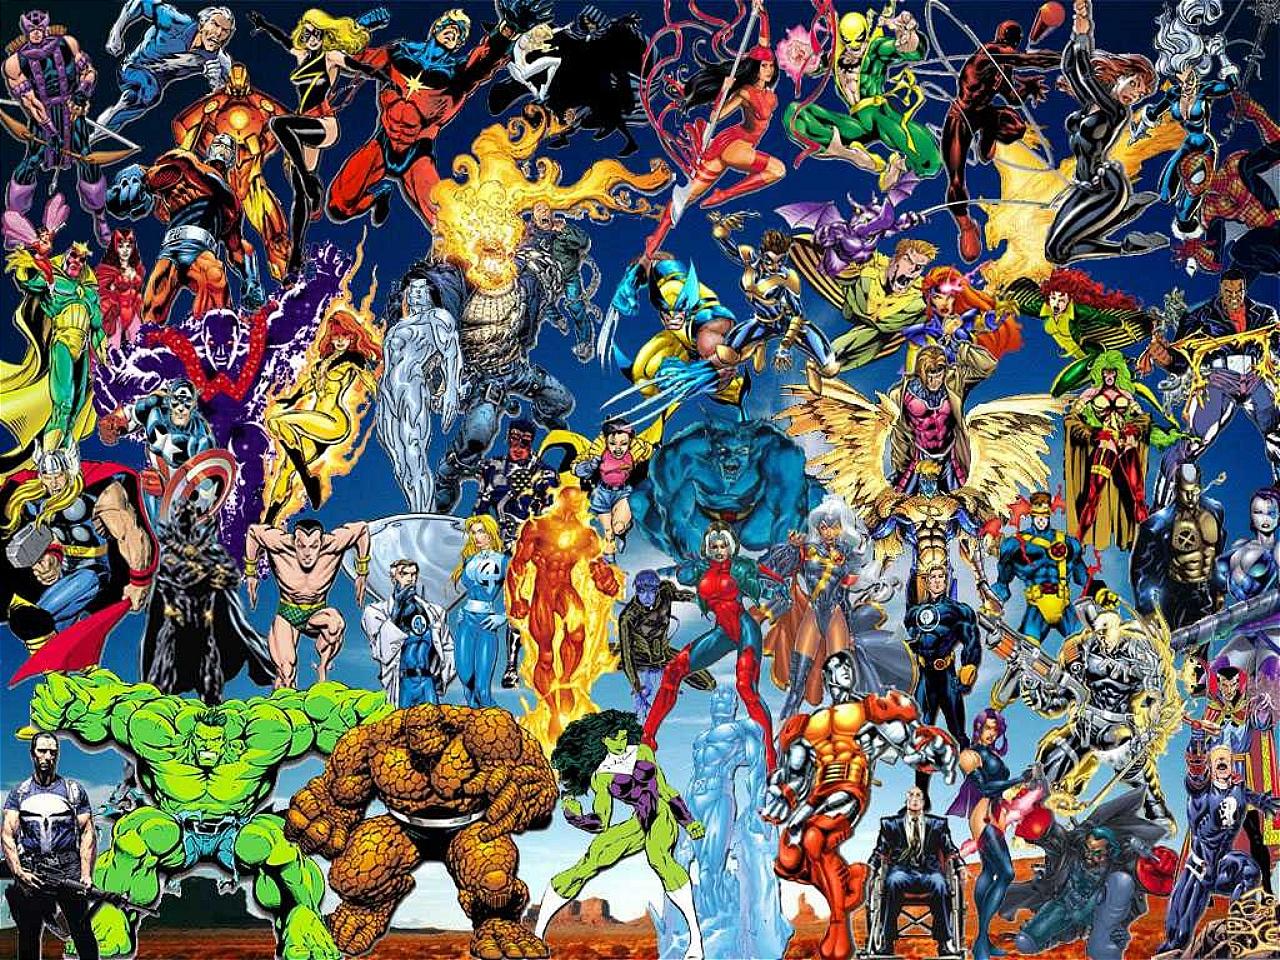 Wallpapers   Comics   Desktop Wallpaper   comics Pictures   Marvel 1280x960